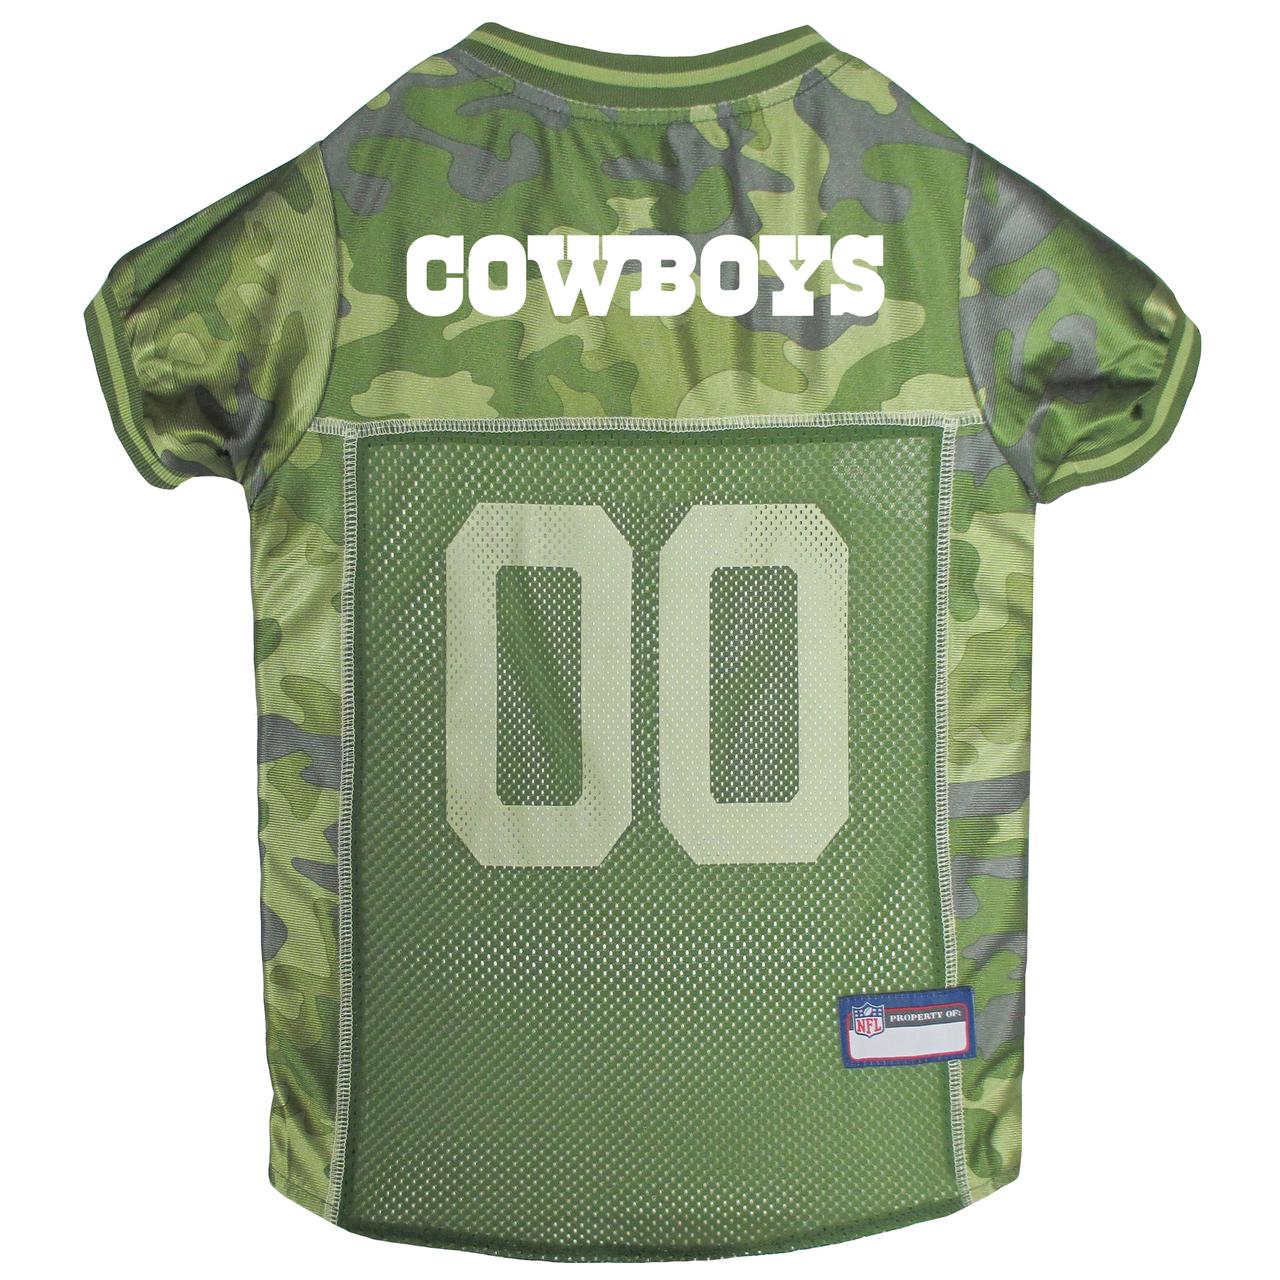 Hot Dog Dallas Cowboys NFL Football Camo Pet/ Dog Jersey